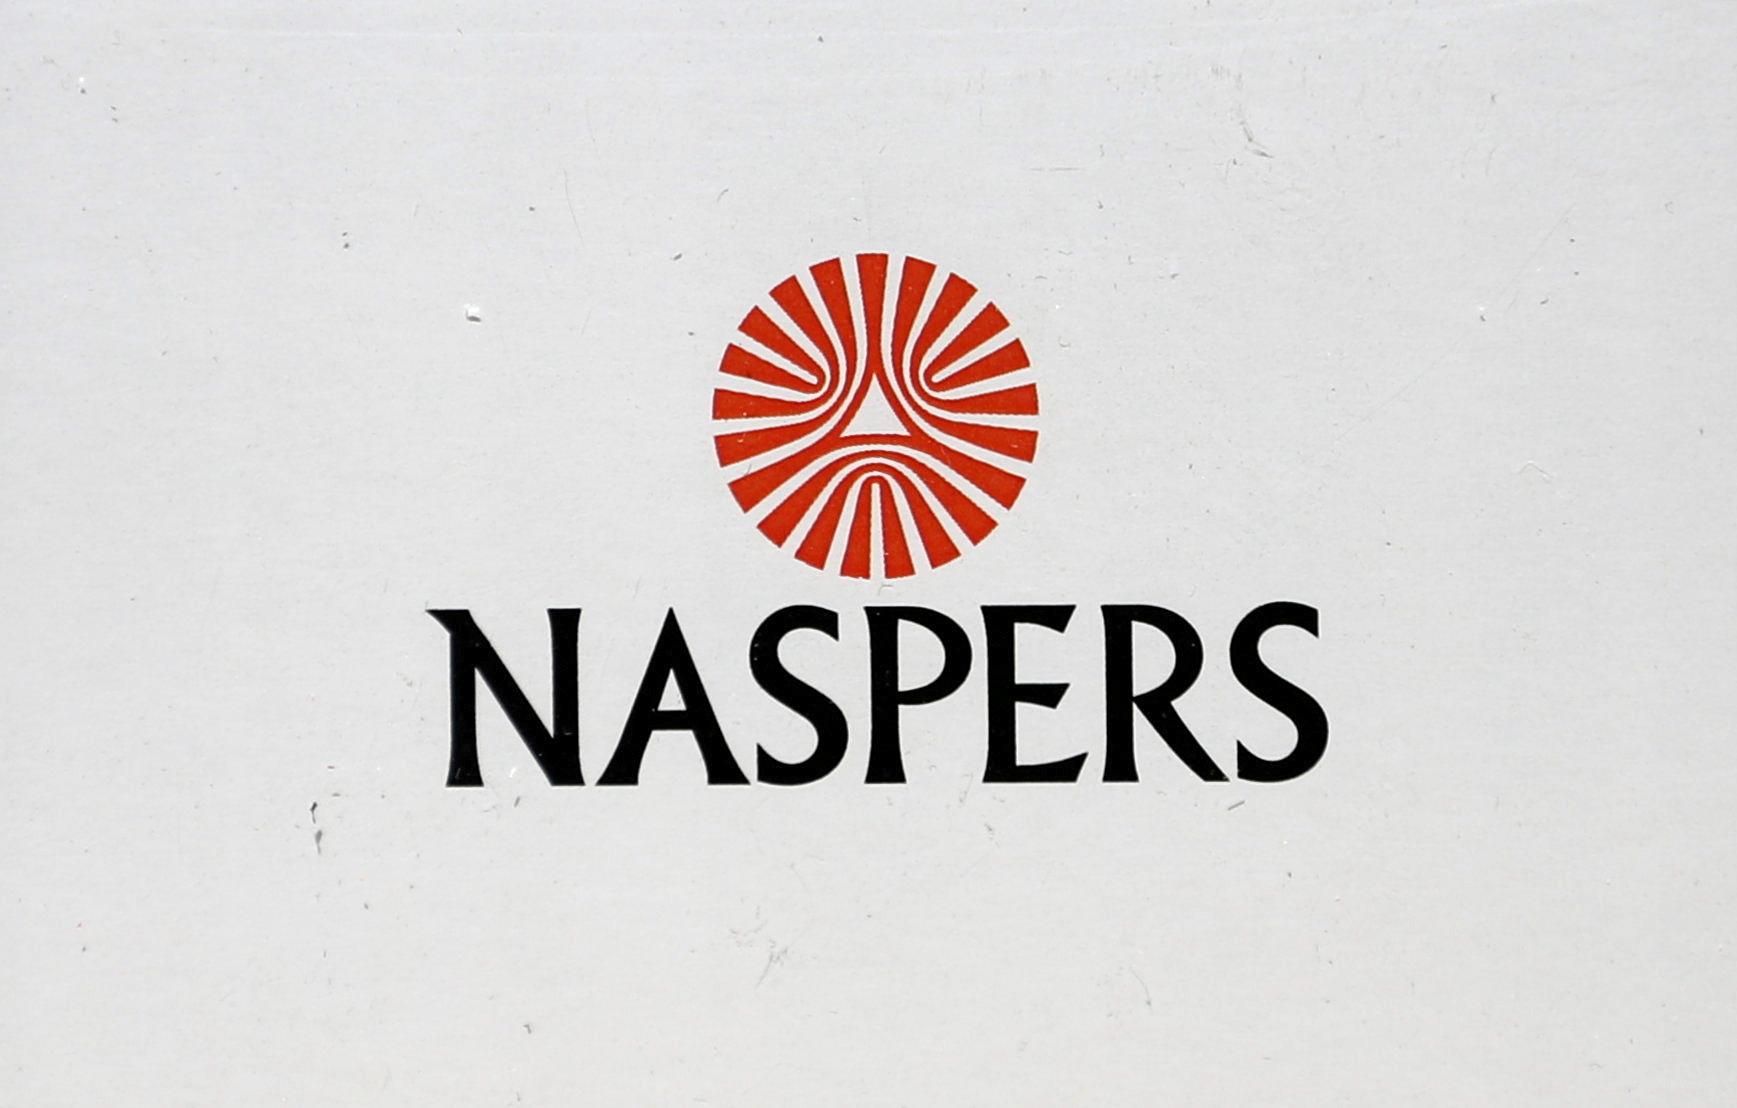 Naspers logo is seen in Johannesburg, South Africa, October 9, 2019. REUTERS/Siphiwe Sibeko